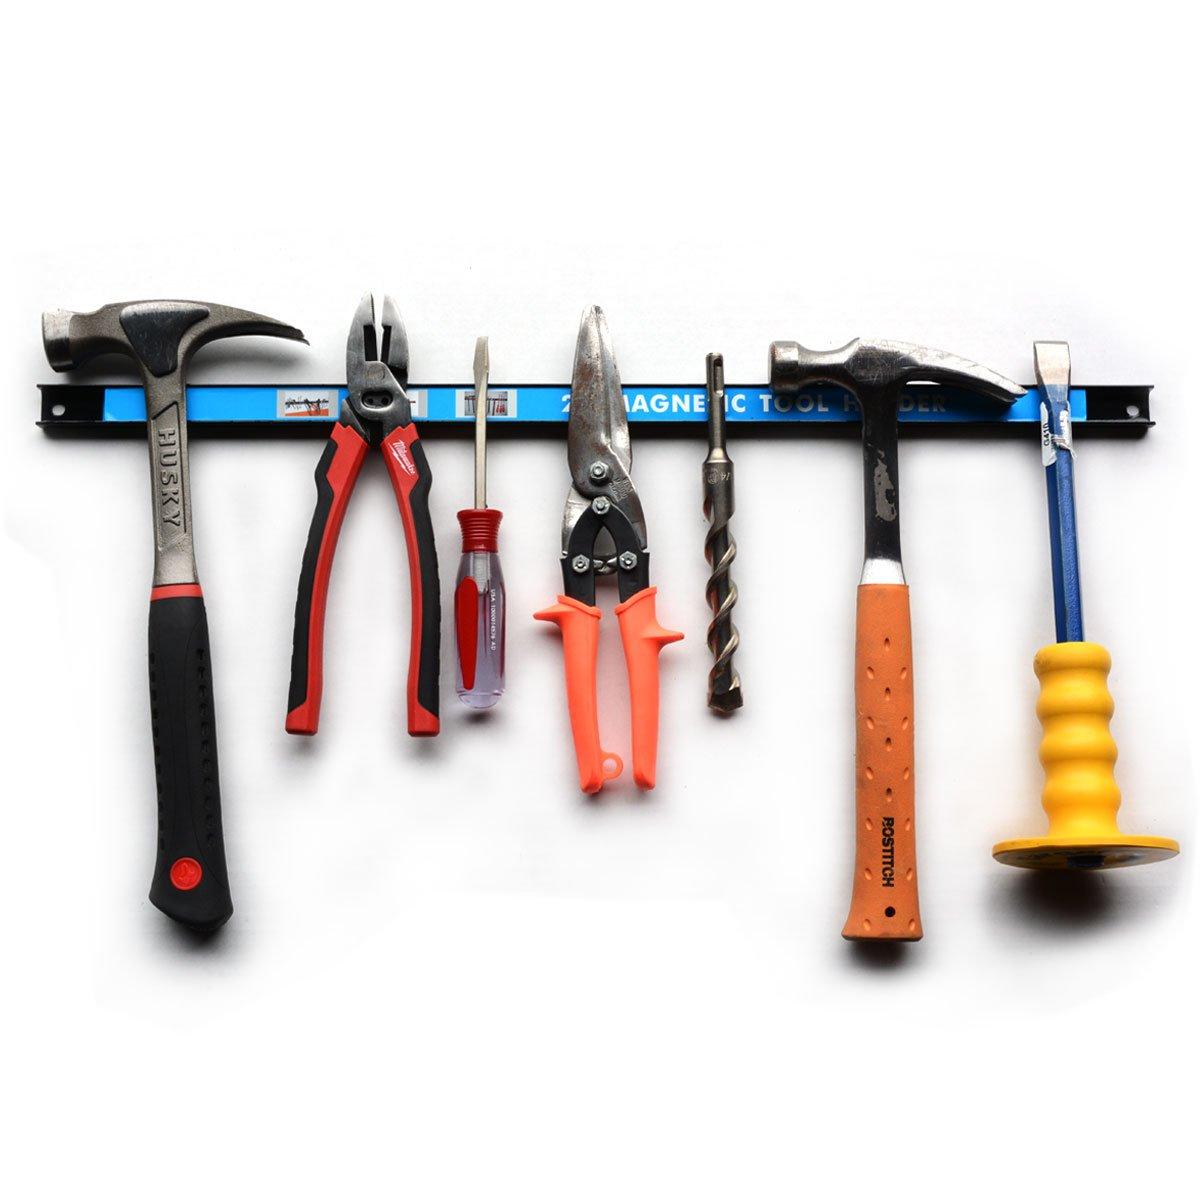 CMS Magnetics 24.75'' Tool Holder for Home Improvement